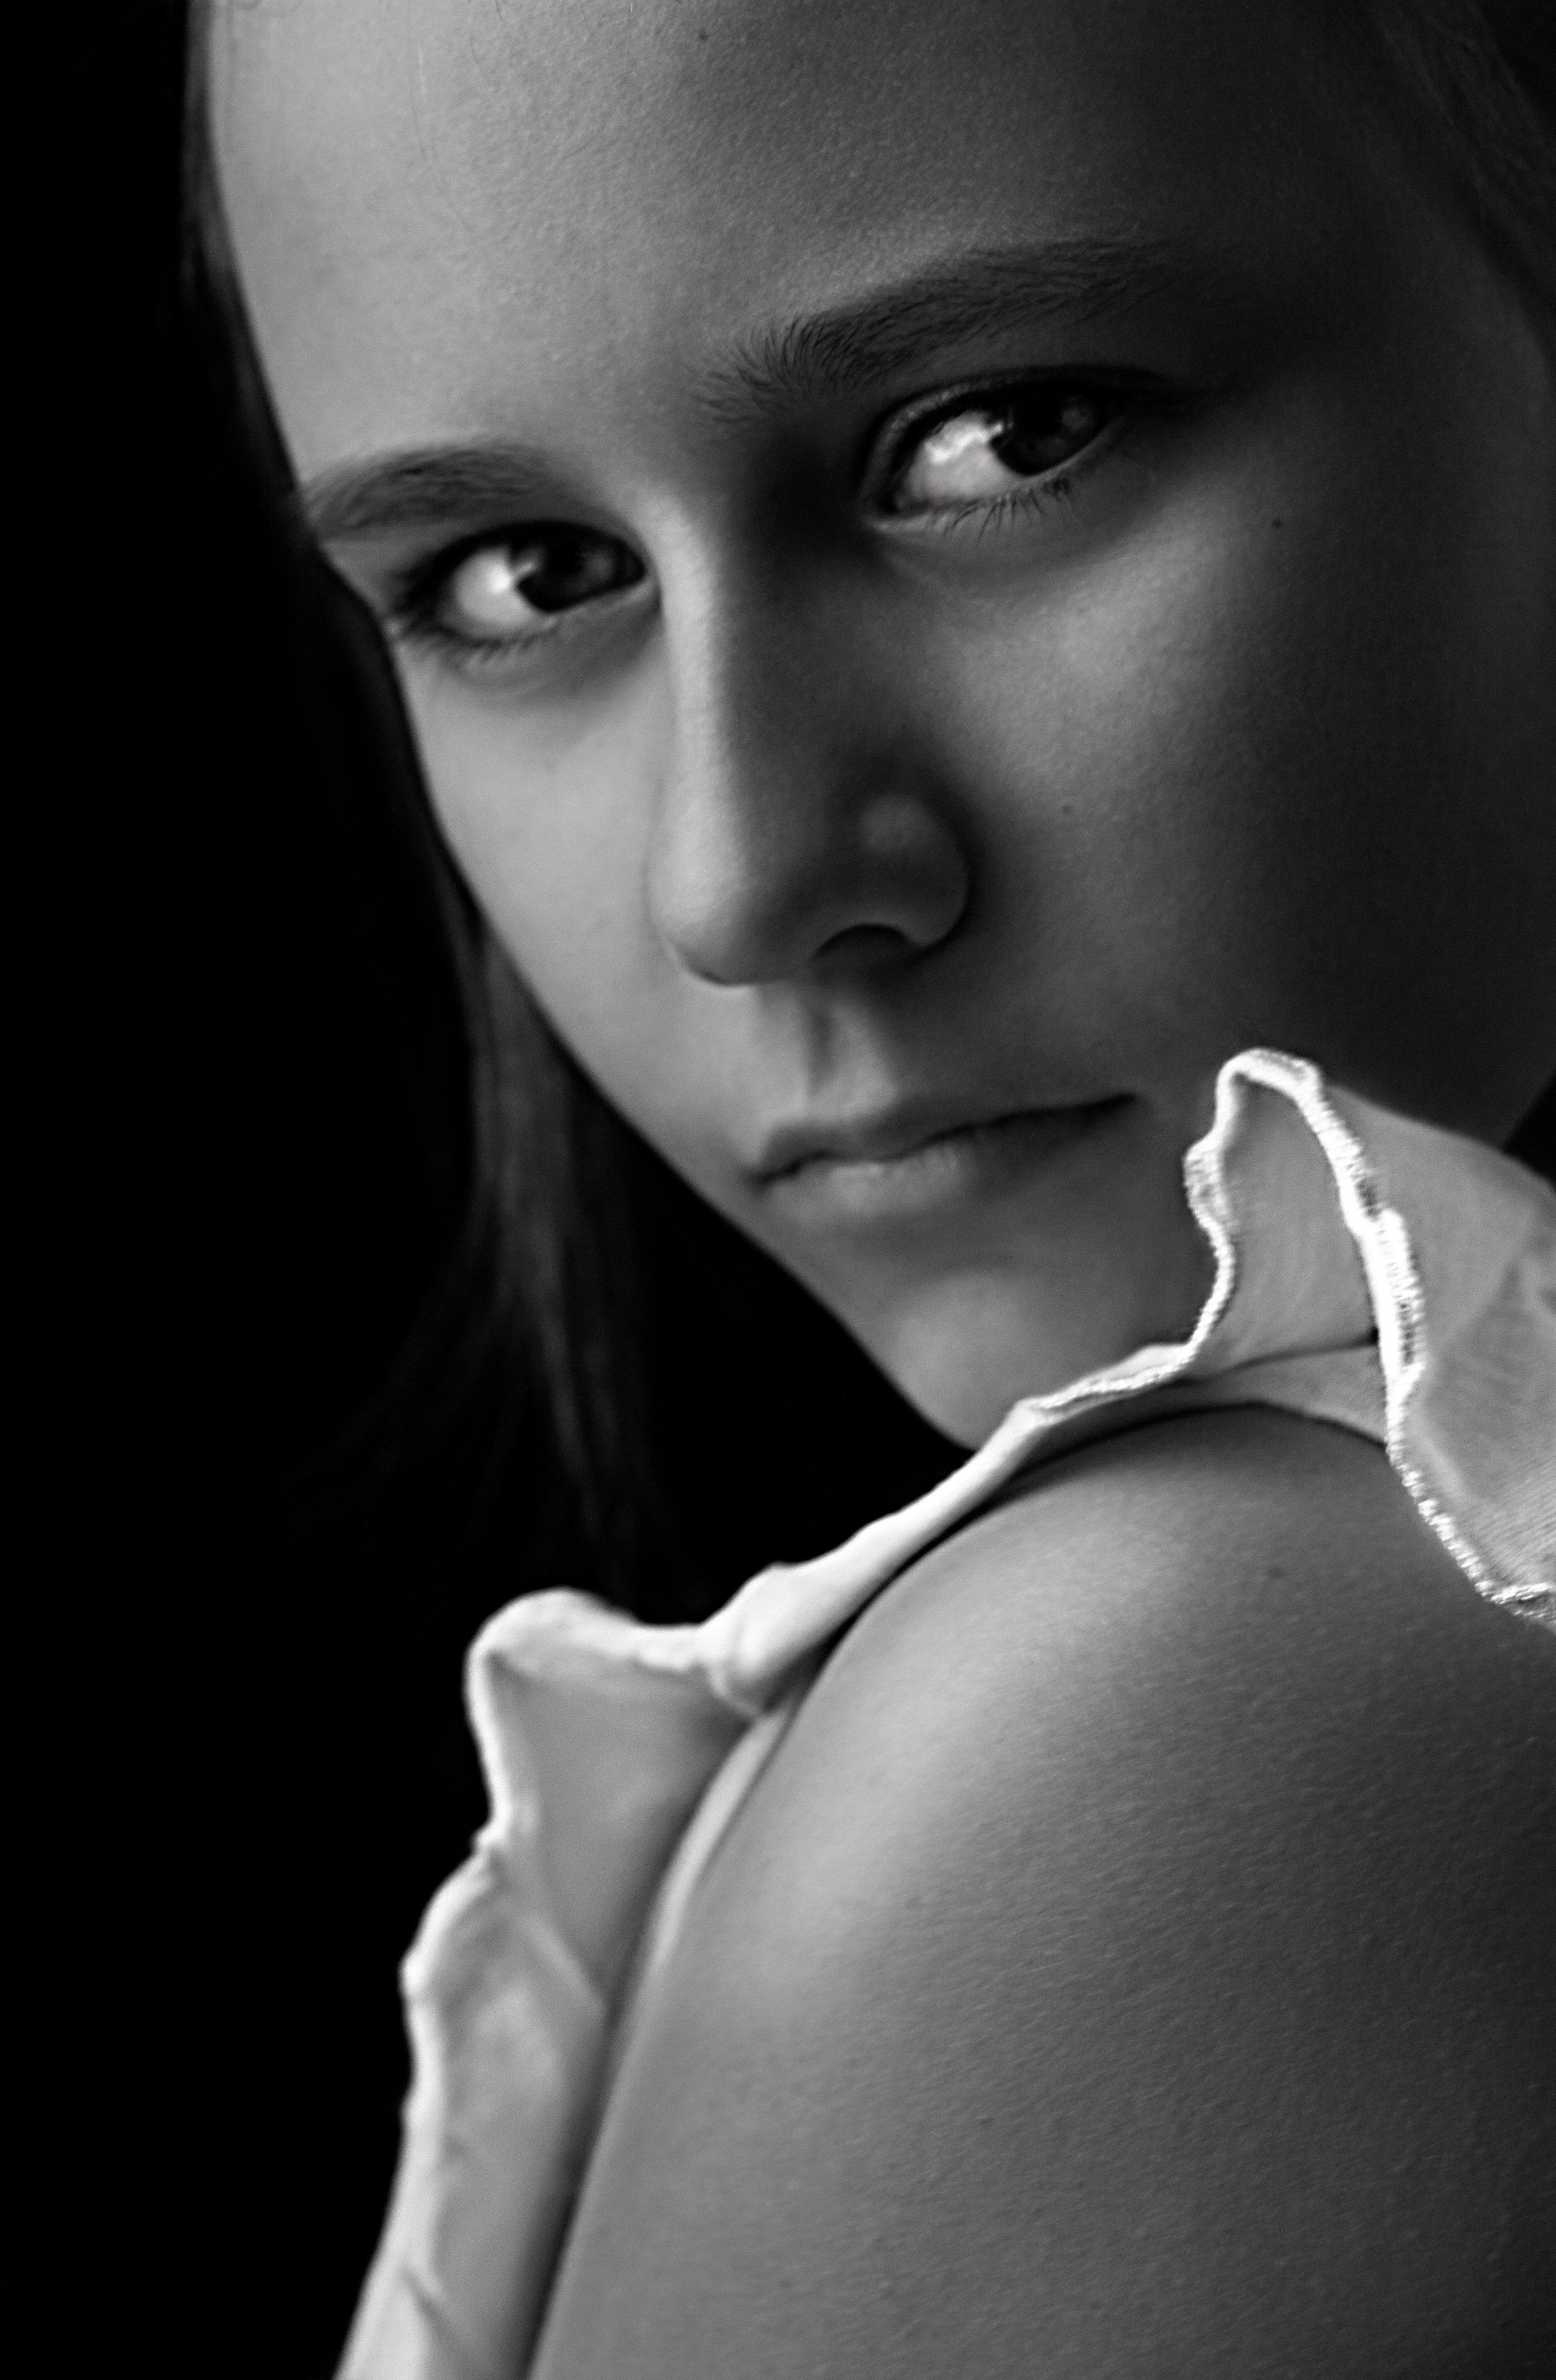 portrait, face, eyes, emotional, портрет, дети, child, girl, анна шацкая